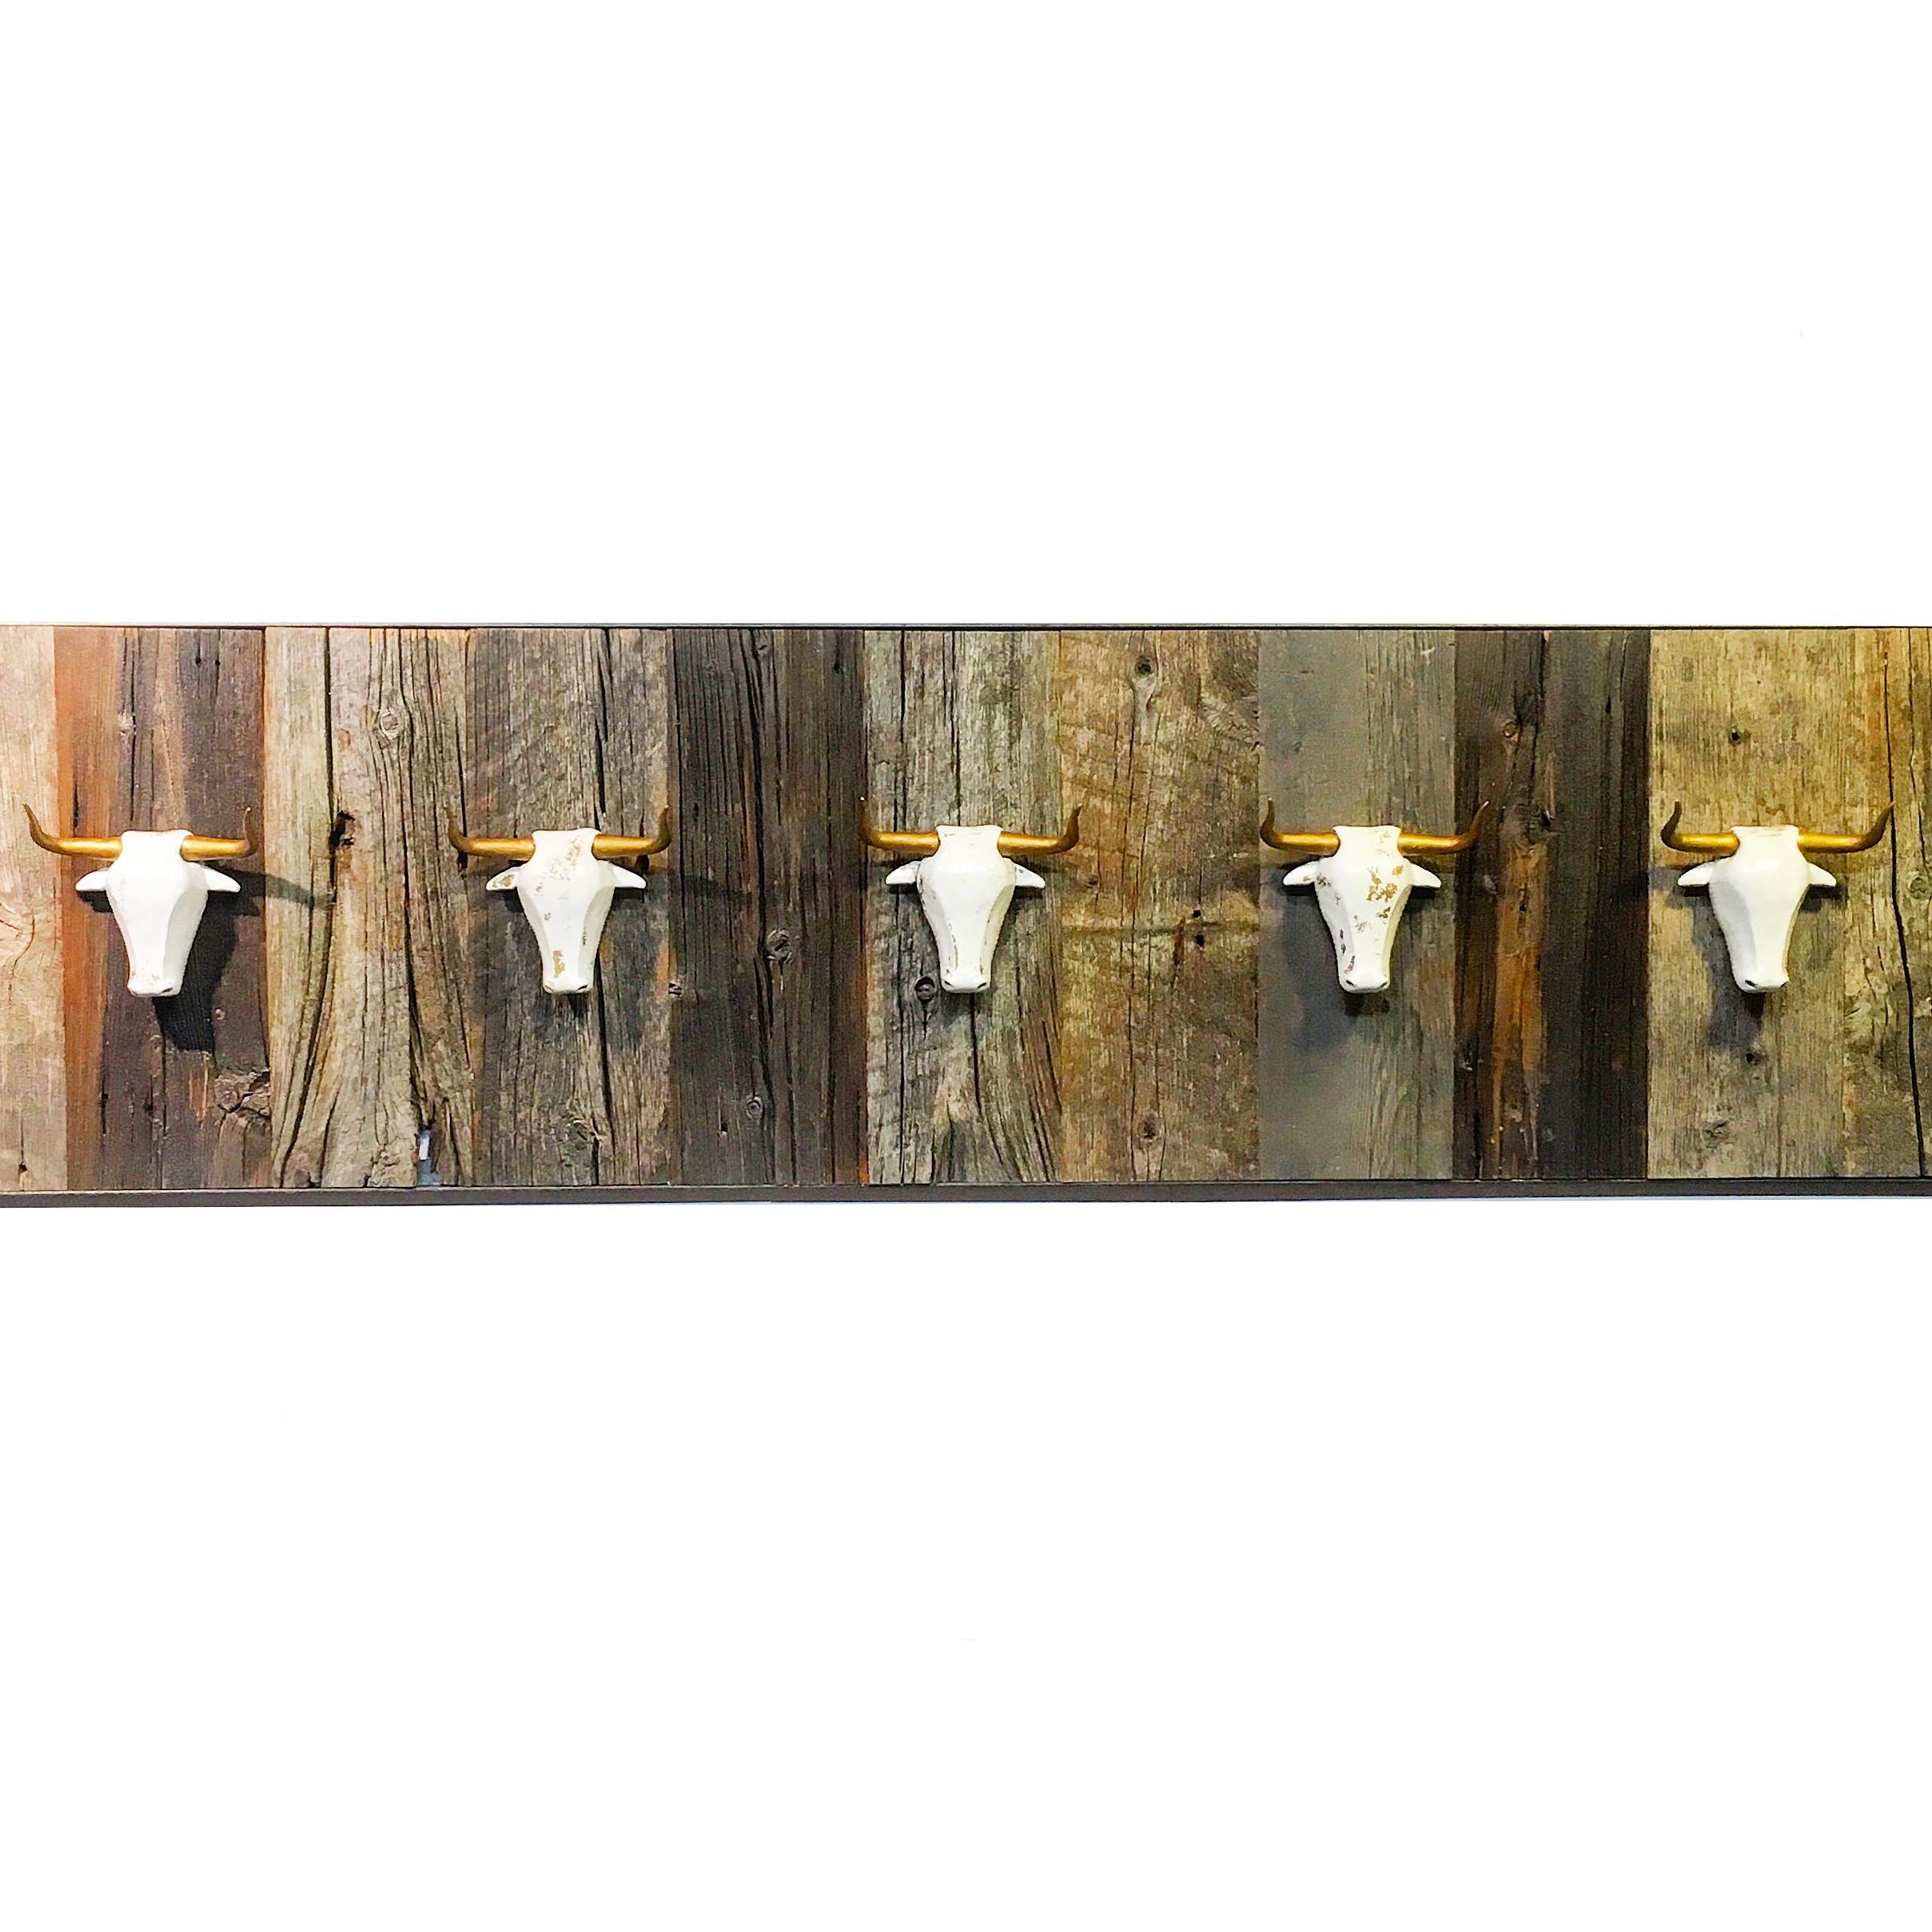 5 Bulls - 12